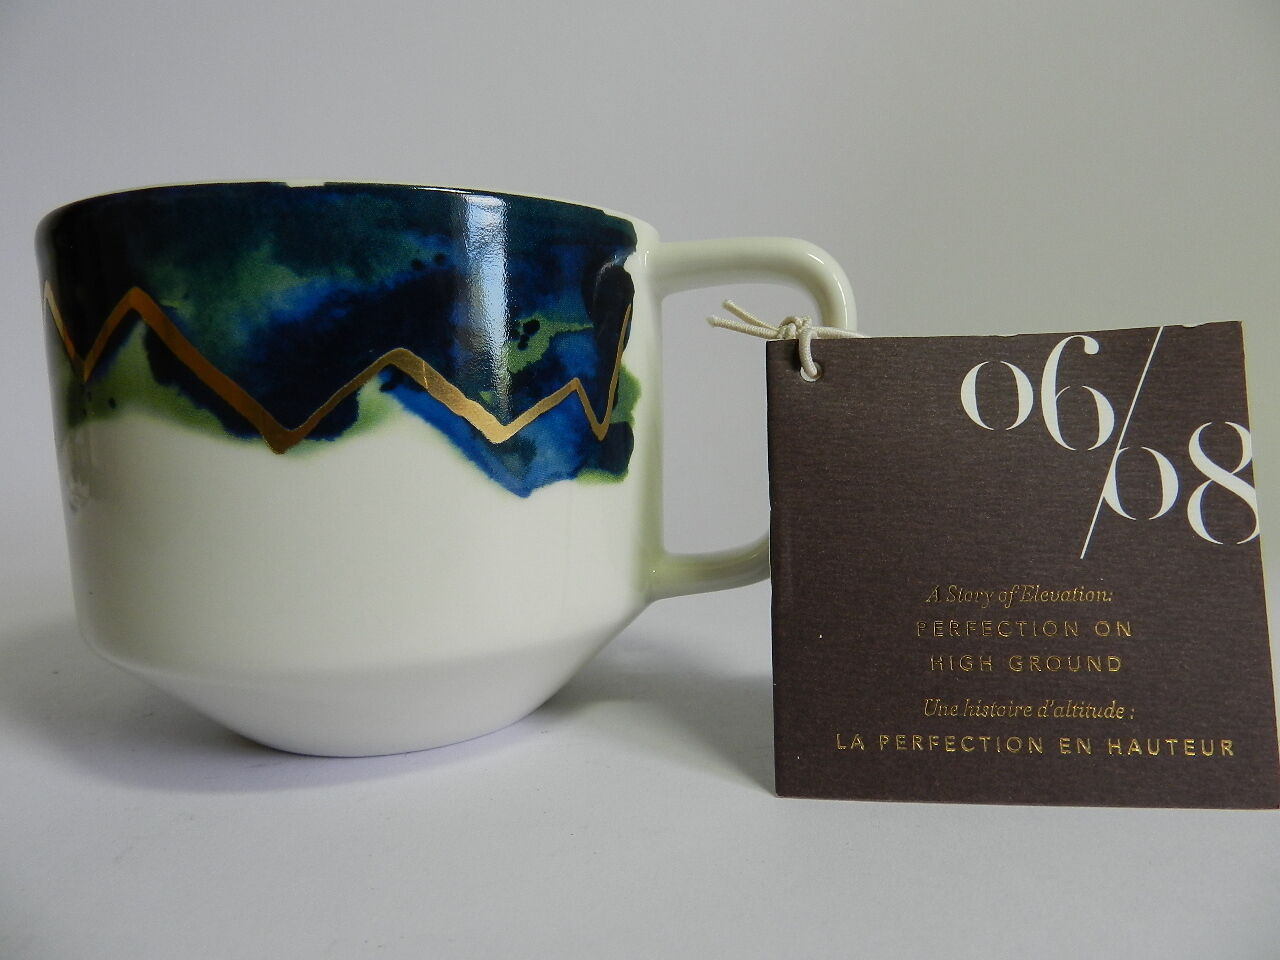 Starbucks Coffee Mugs Artisan Series 06/08 - 12 Fl Oz, Great